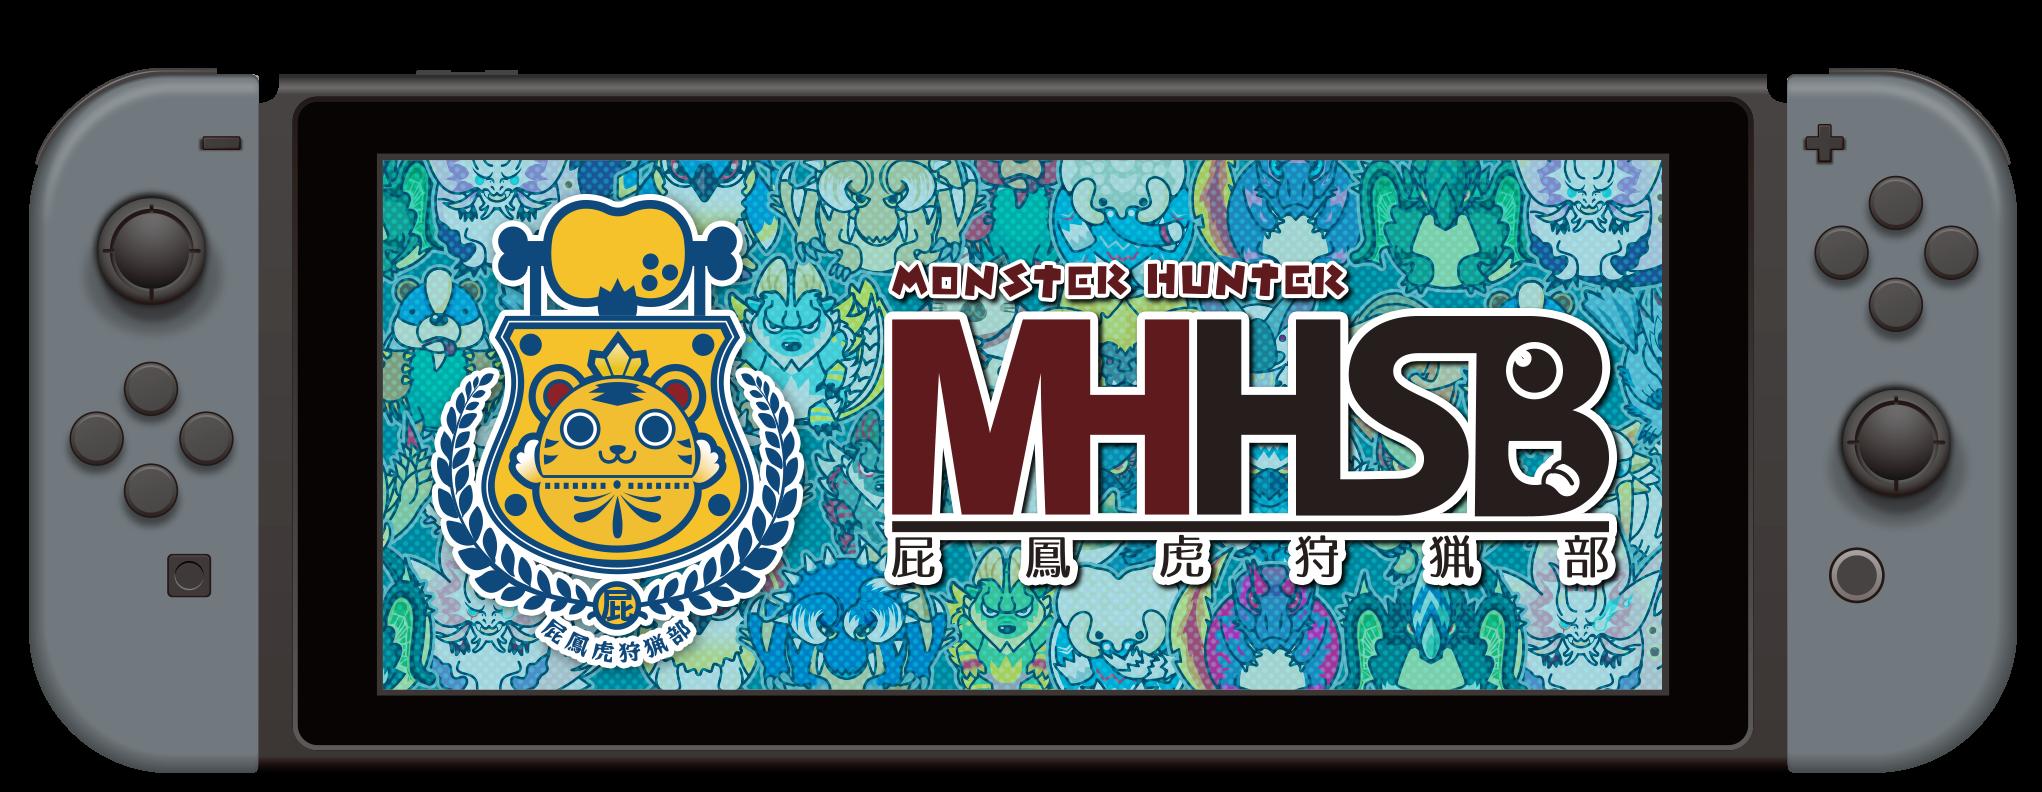 屁鳳虎狩猟部 -Monster Hunter-